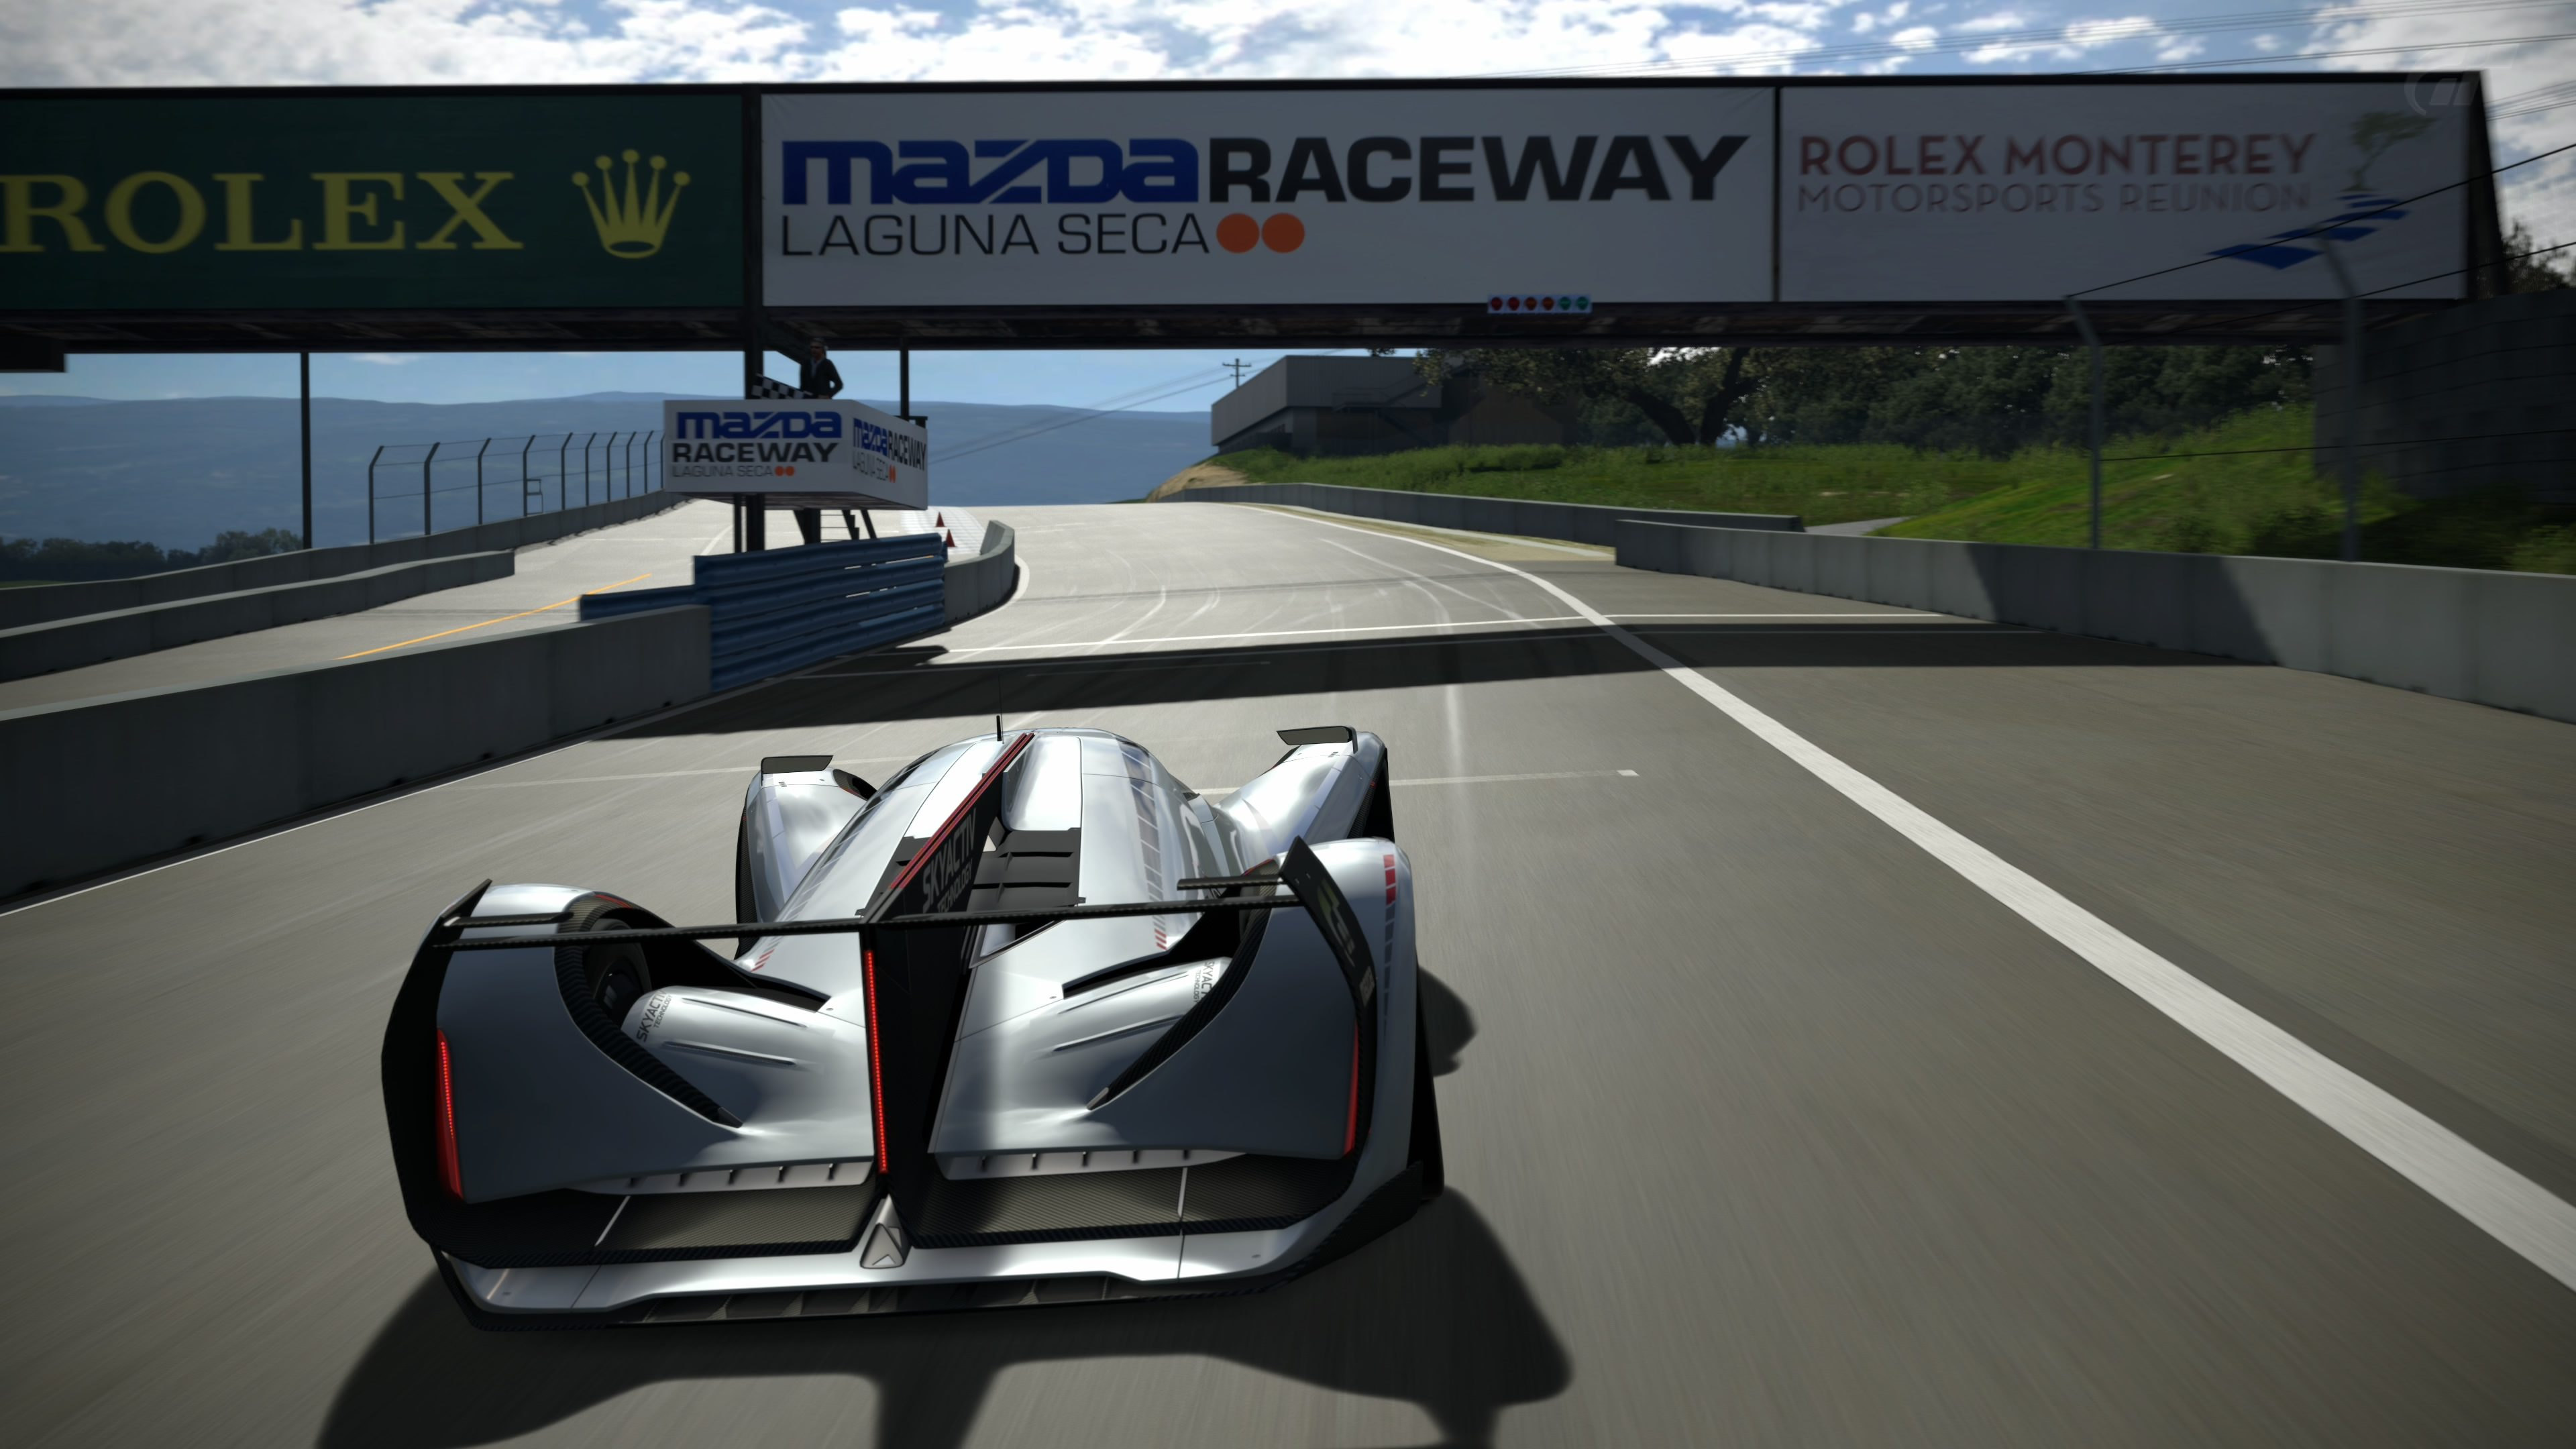 Mazda Raceway Laguna Seca _1.jpg